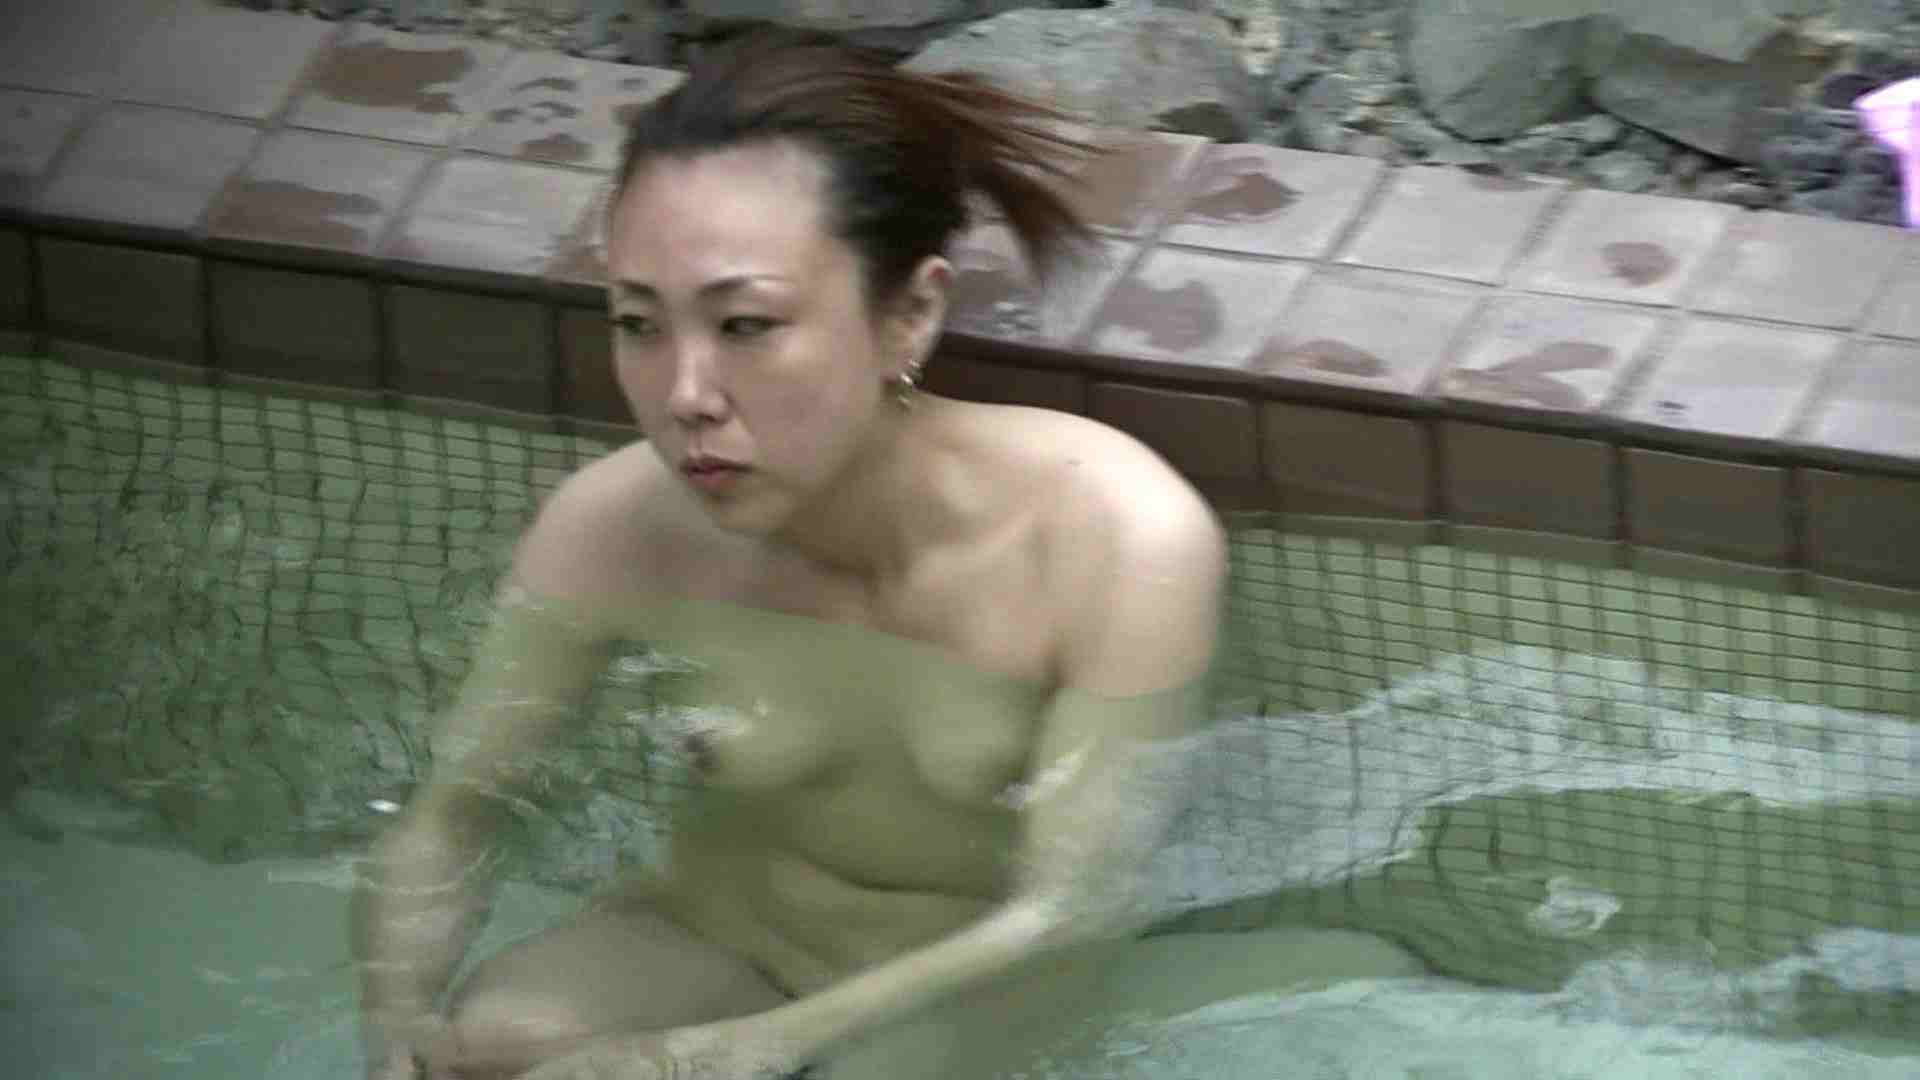 Aquaな露天風呂Vol.654 OLすけべ画像   盗撮  38連発 34